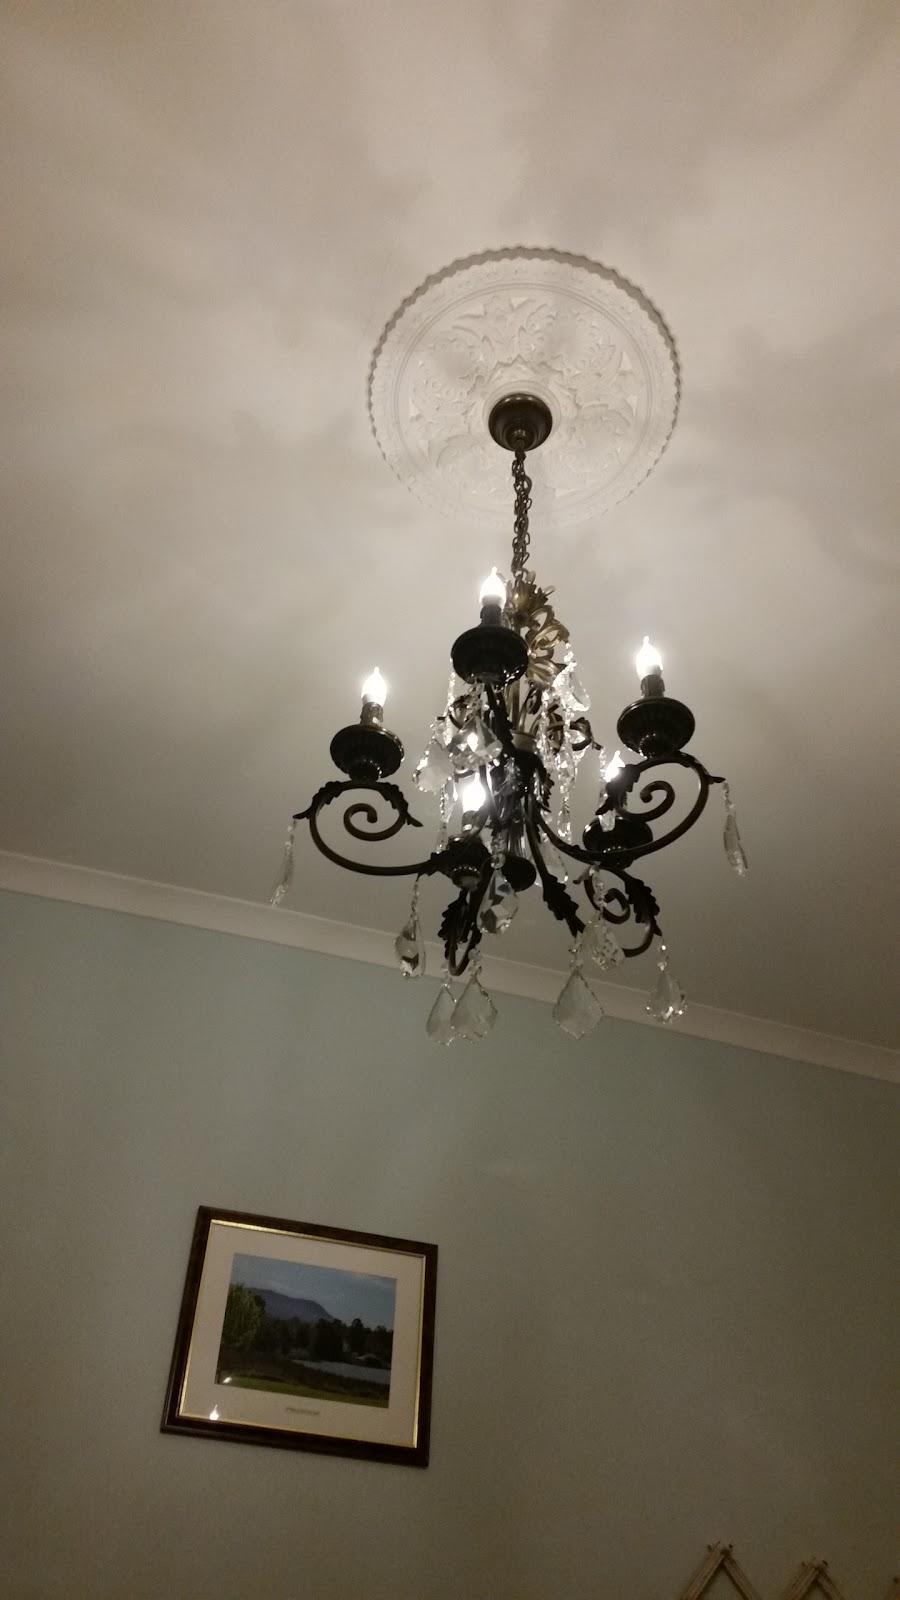 Meriam Bed & Breakfast   lodging   29 Stoke St, New Town TAS 7008, Australia   0362285445 OR +61 3 6228 5445